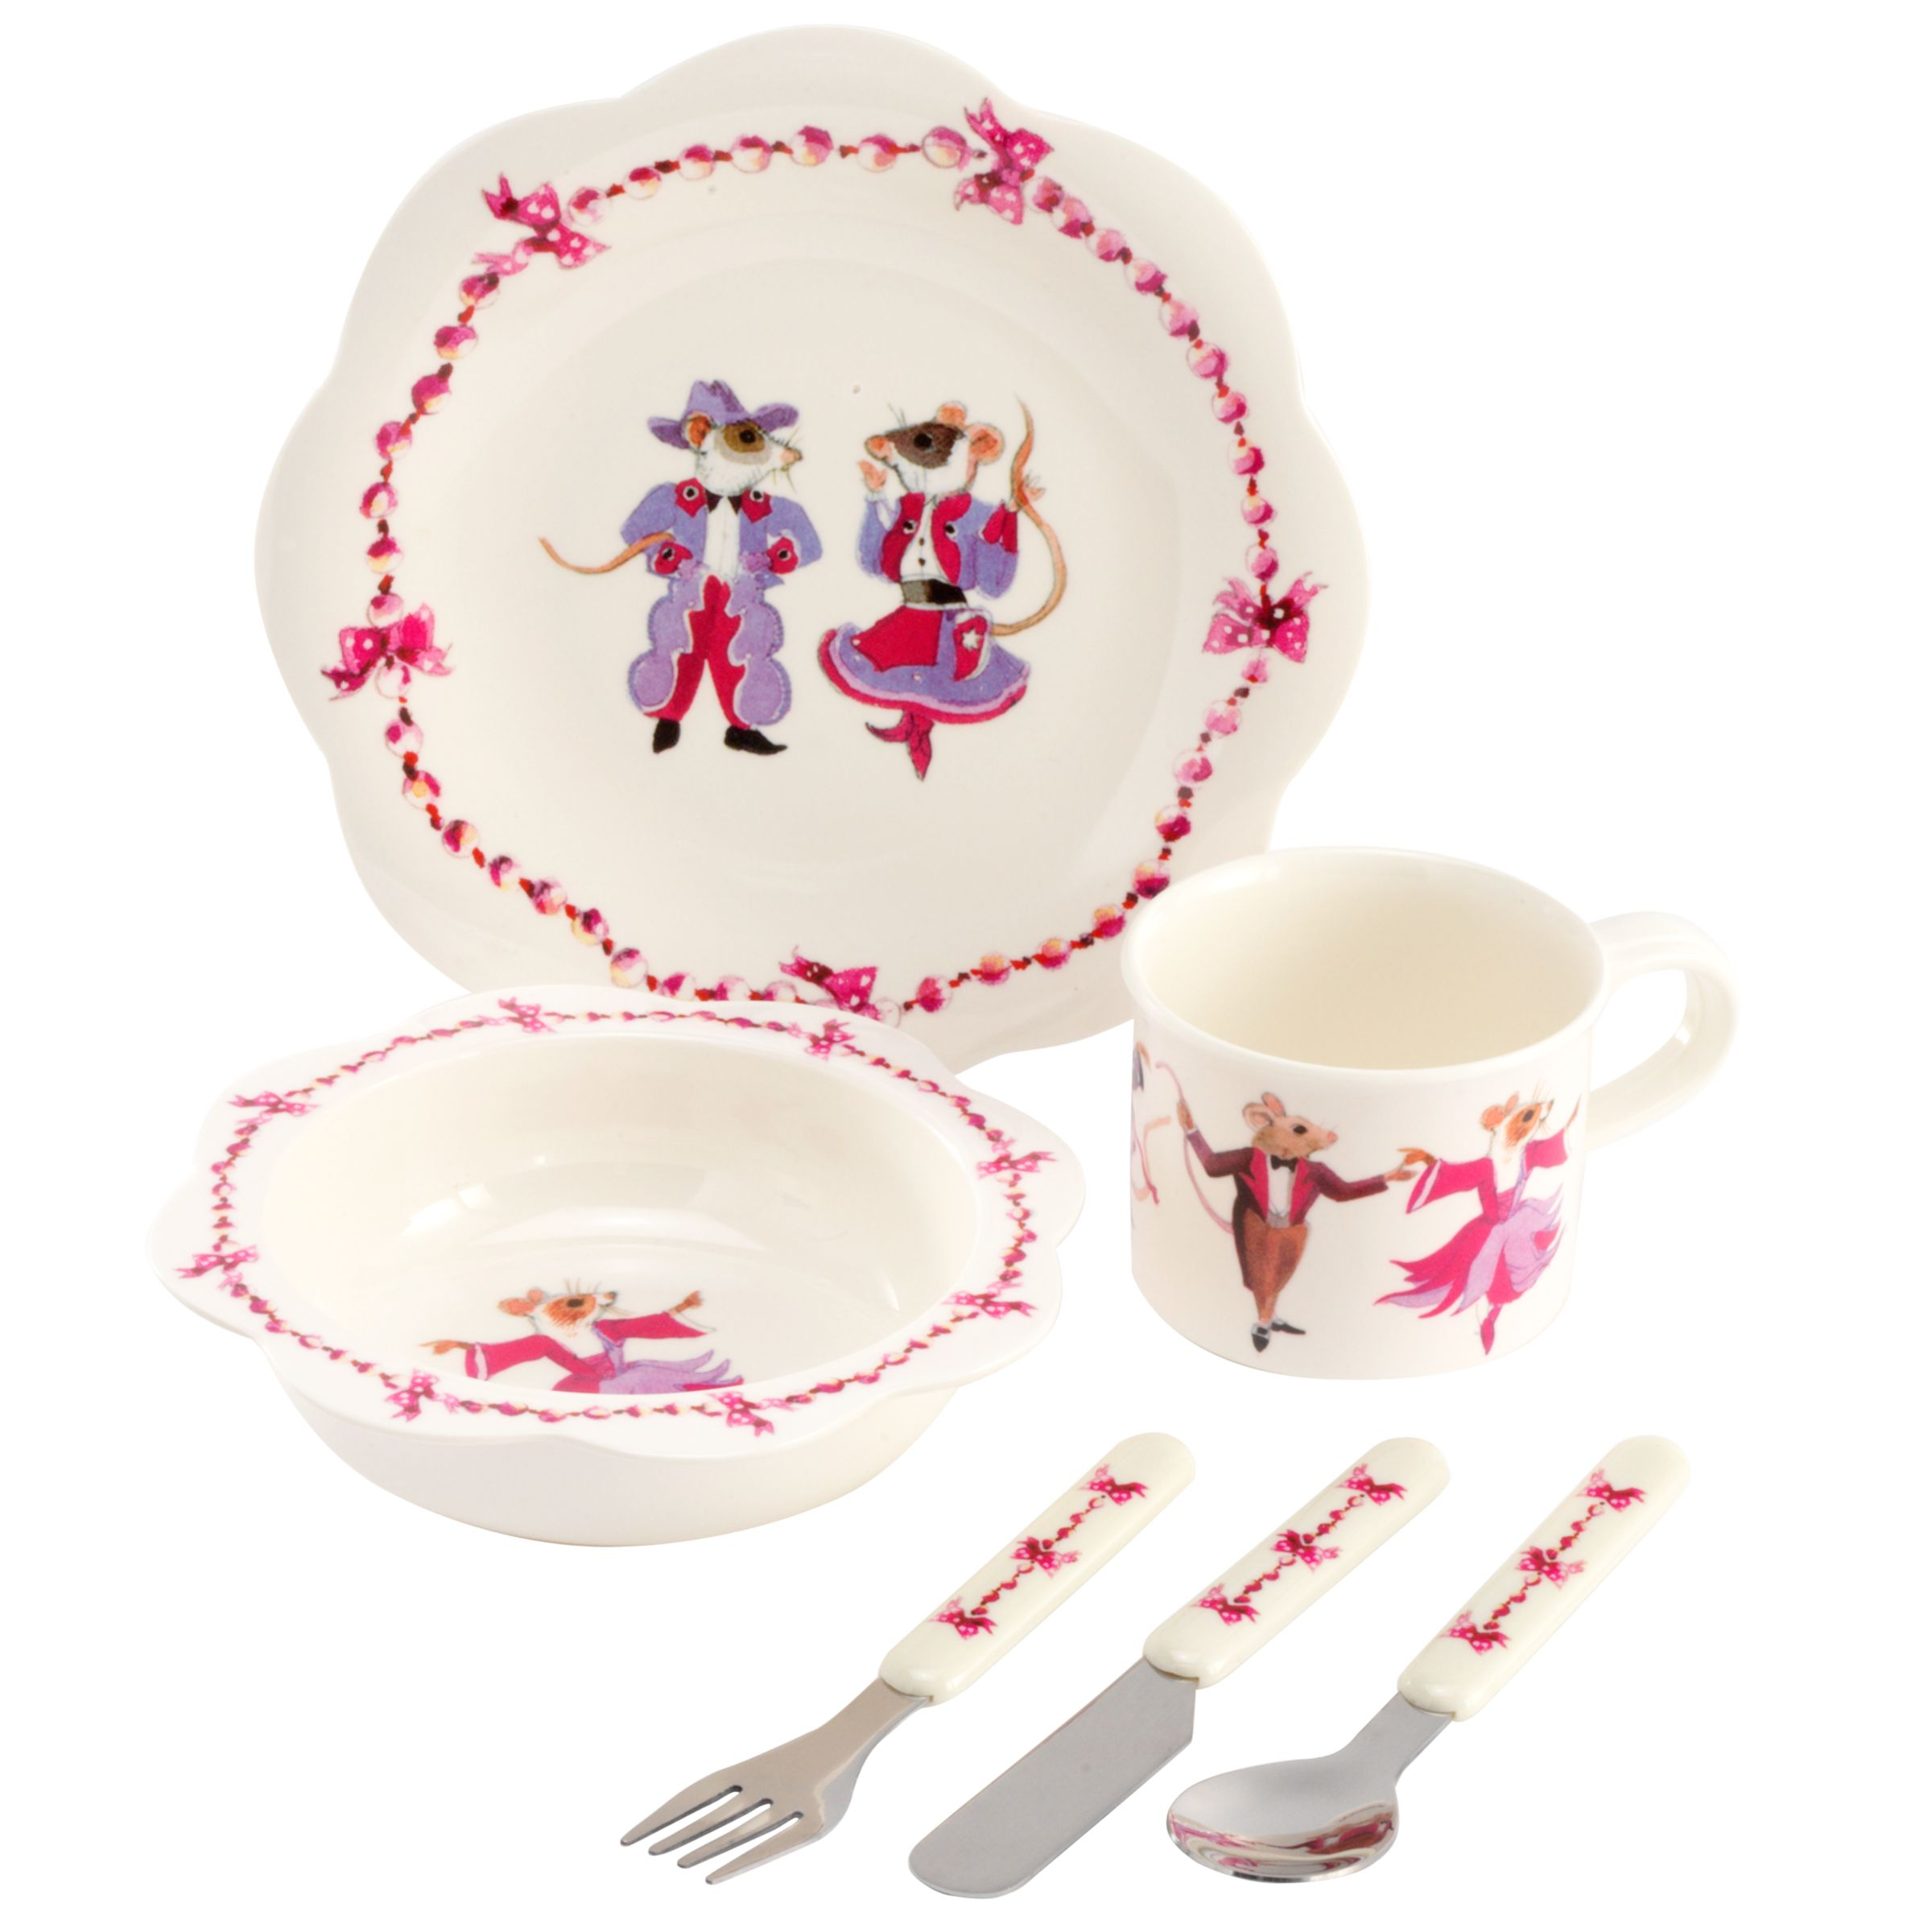 Emma Bridgewater Mouse Plate Set